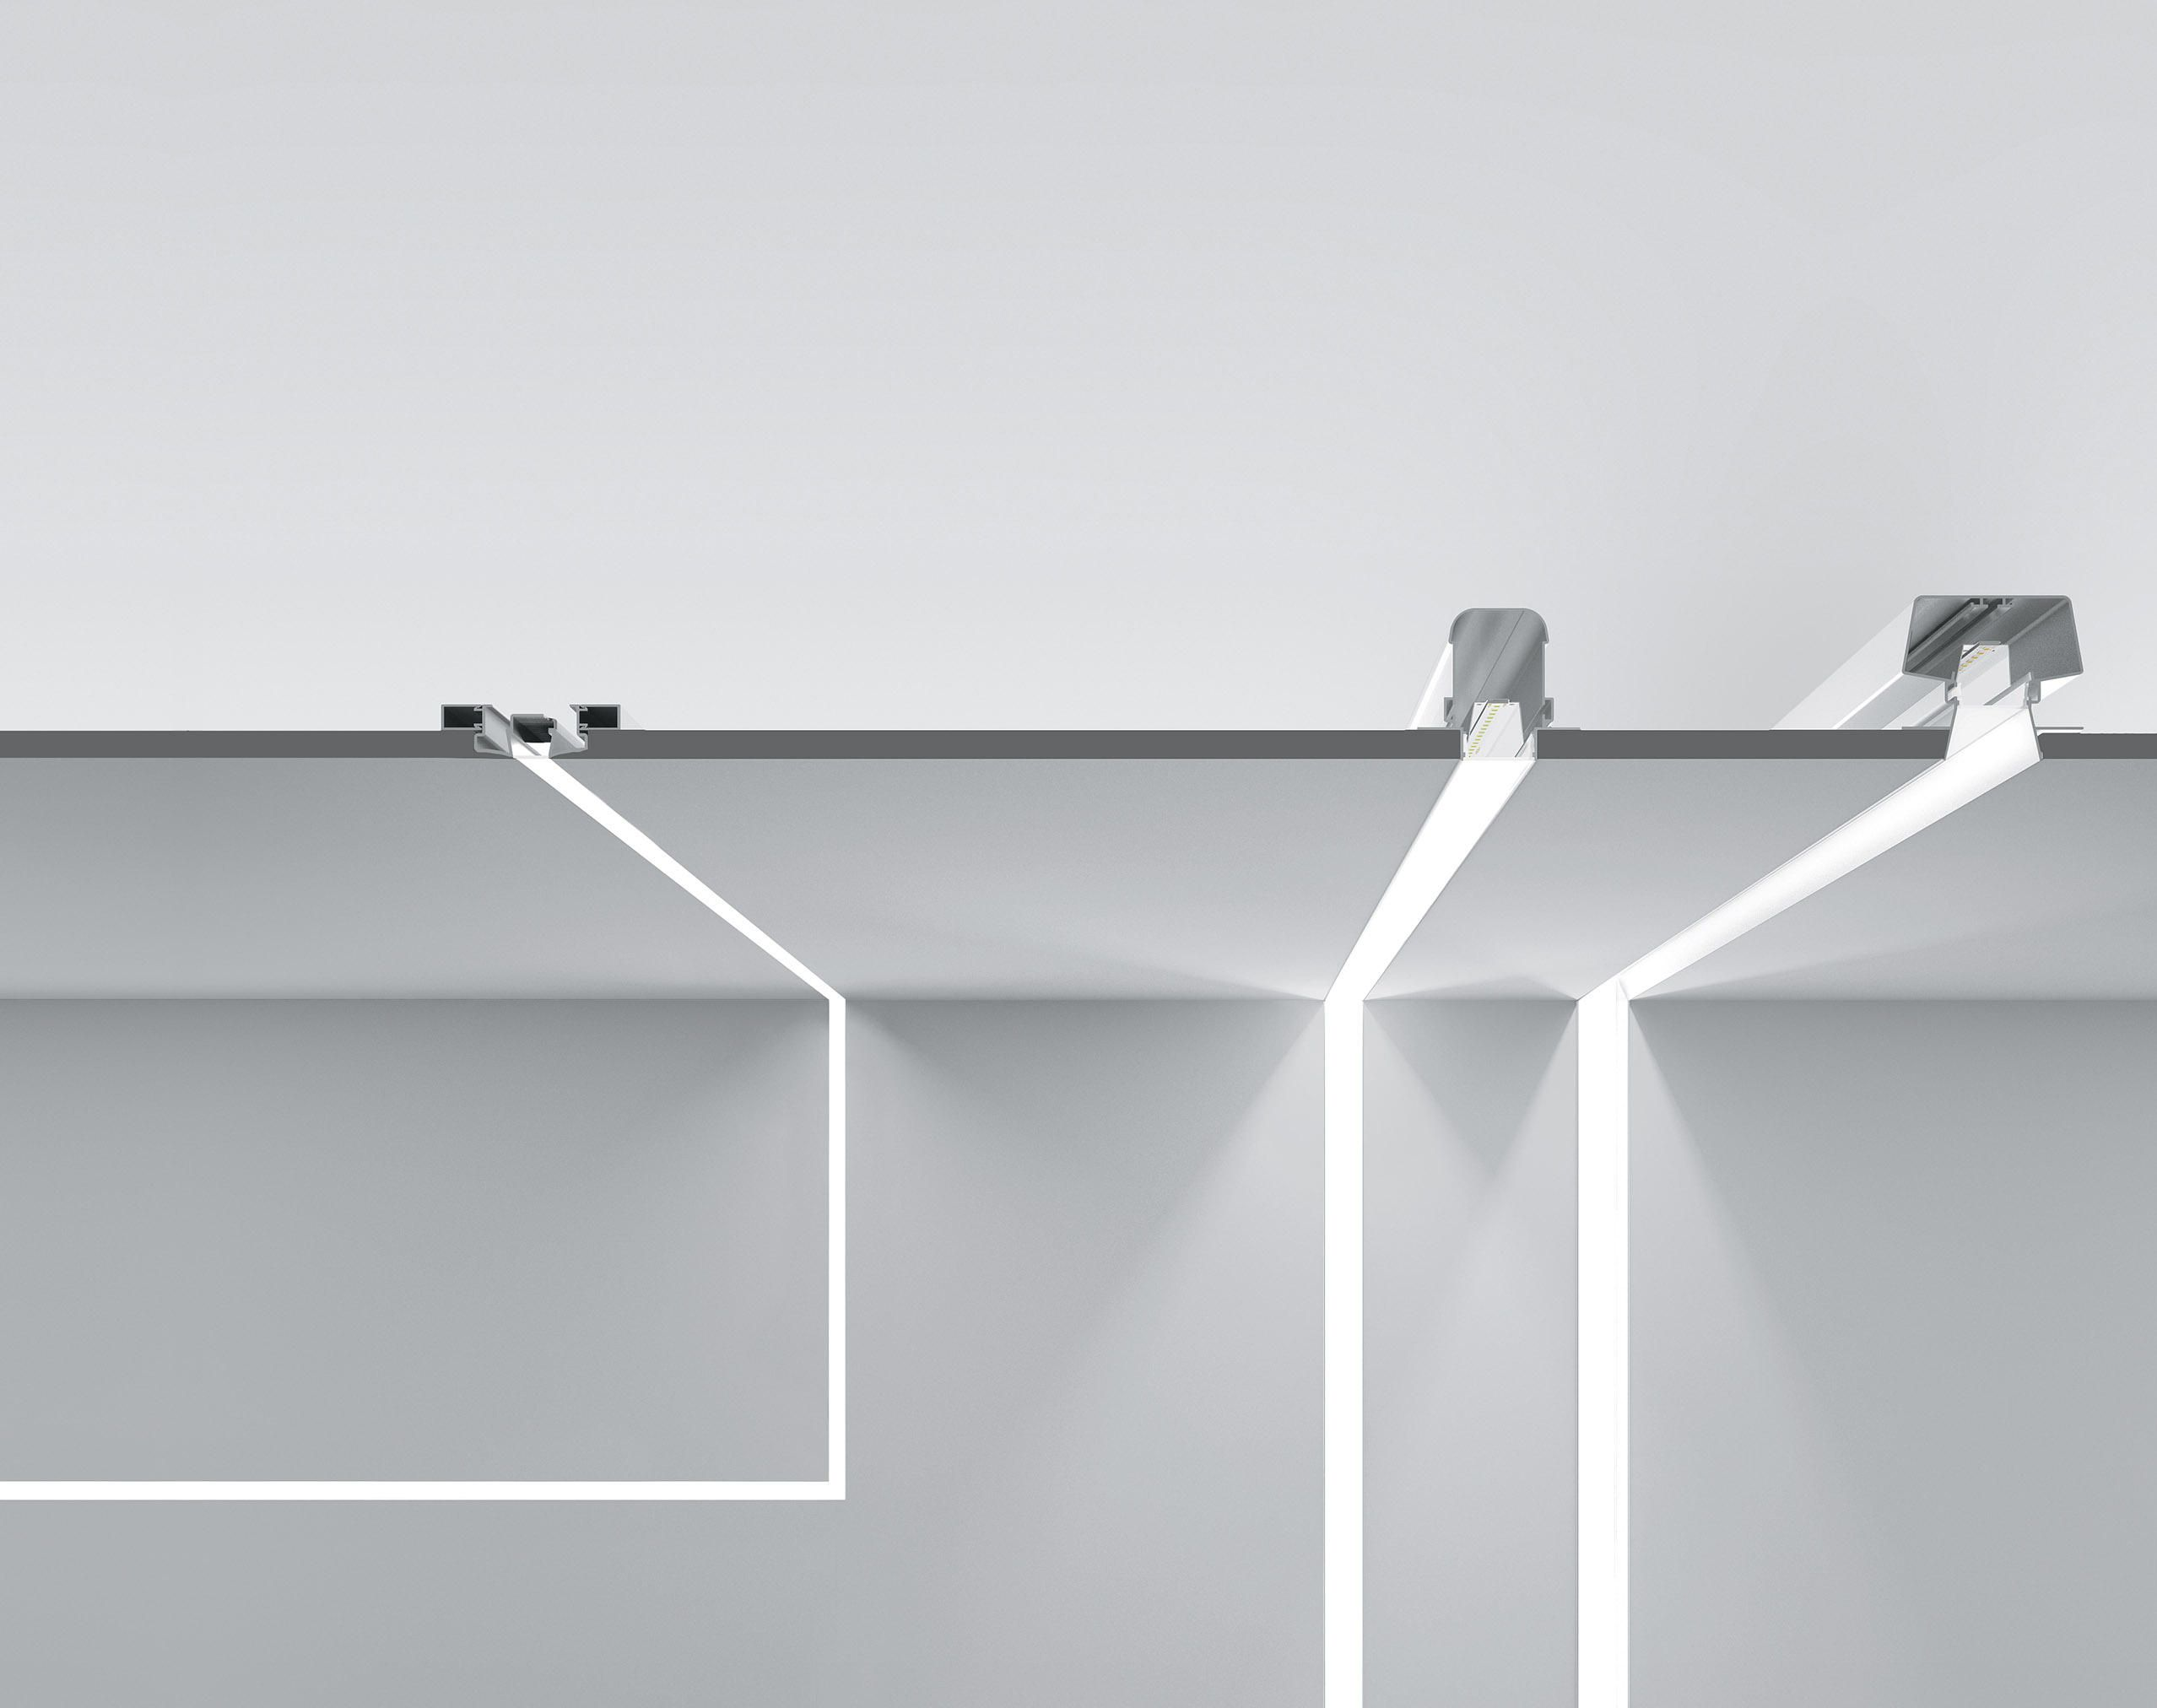 Fylo Profile Von Linea Light Group Architonic Recessed Wall Lights Lighting Design Interior Ceiling Design Modern